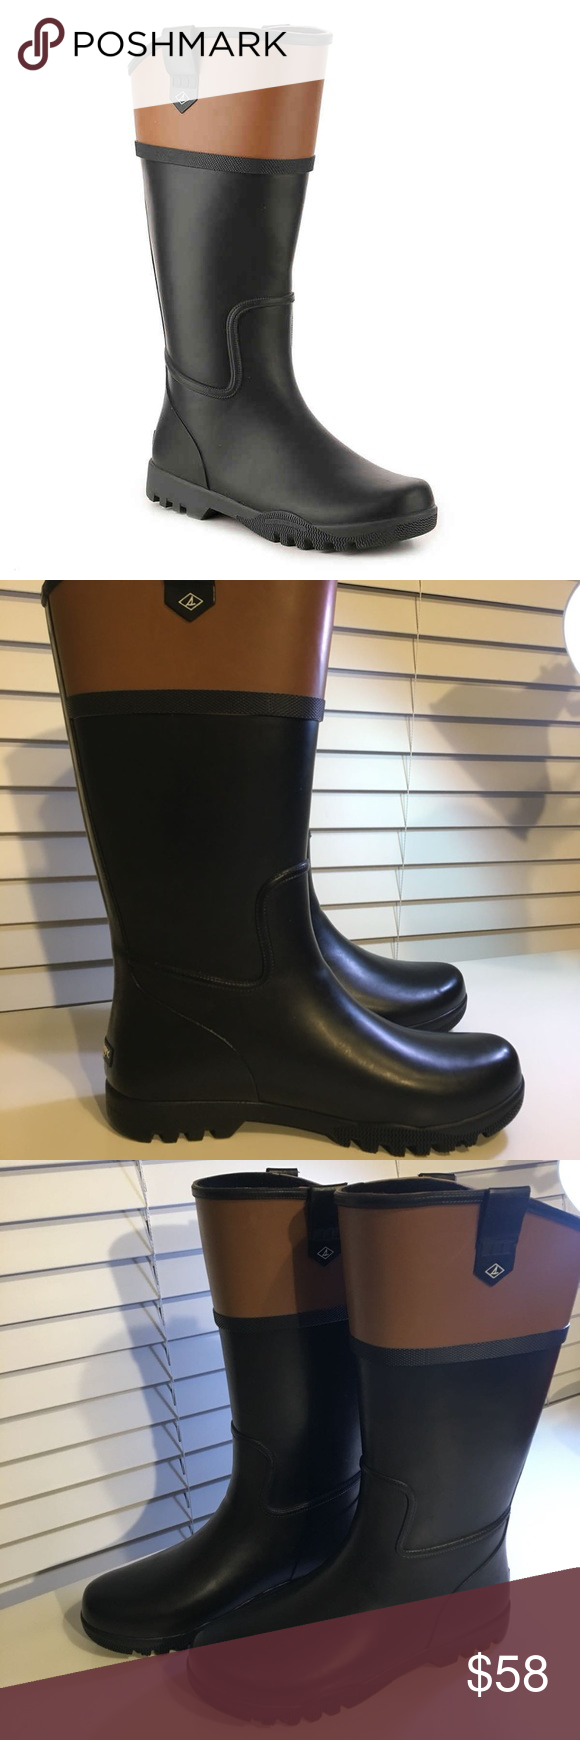 SPERRY Nellie Kate Waterproof Rain Boot